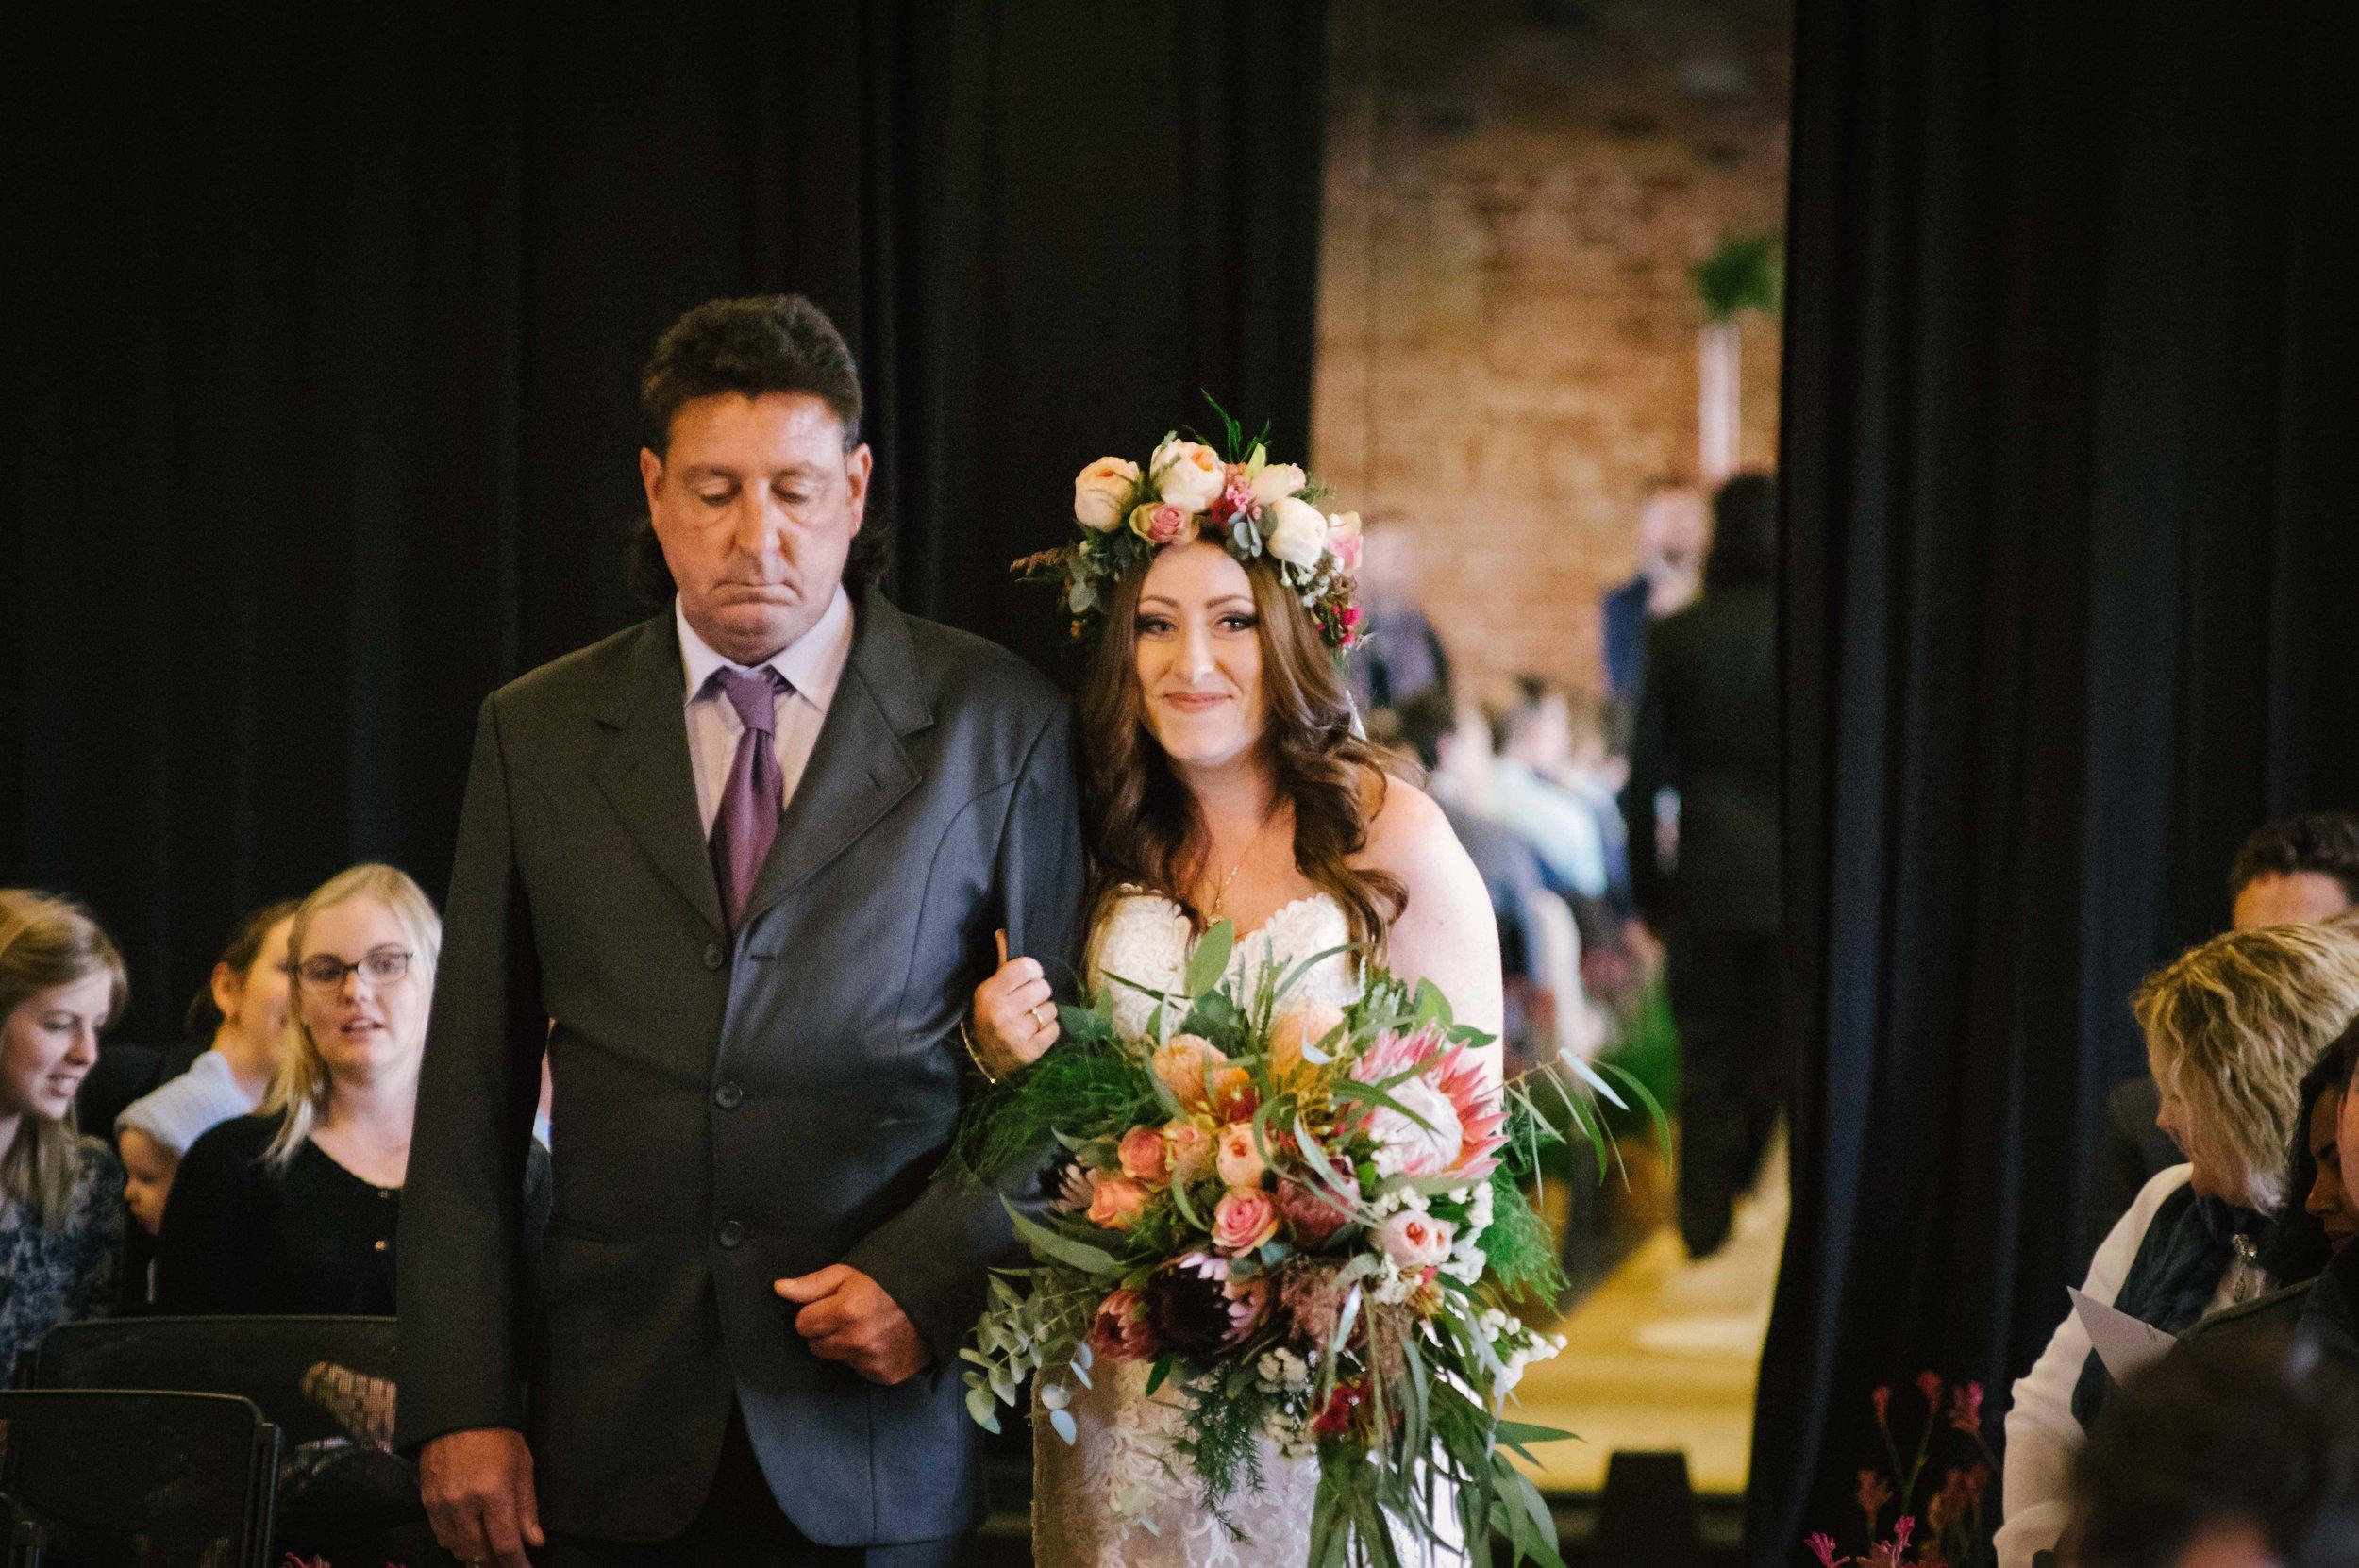 WA Ballet Centre Swan Valley Oakover Grounds Perth Wheatbelt Avon Valley Wedding Photographer (18).jpg